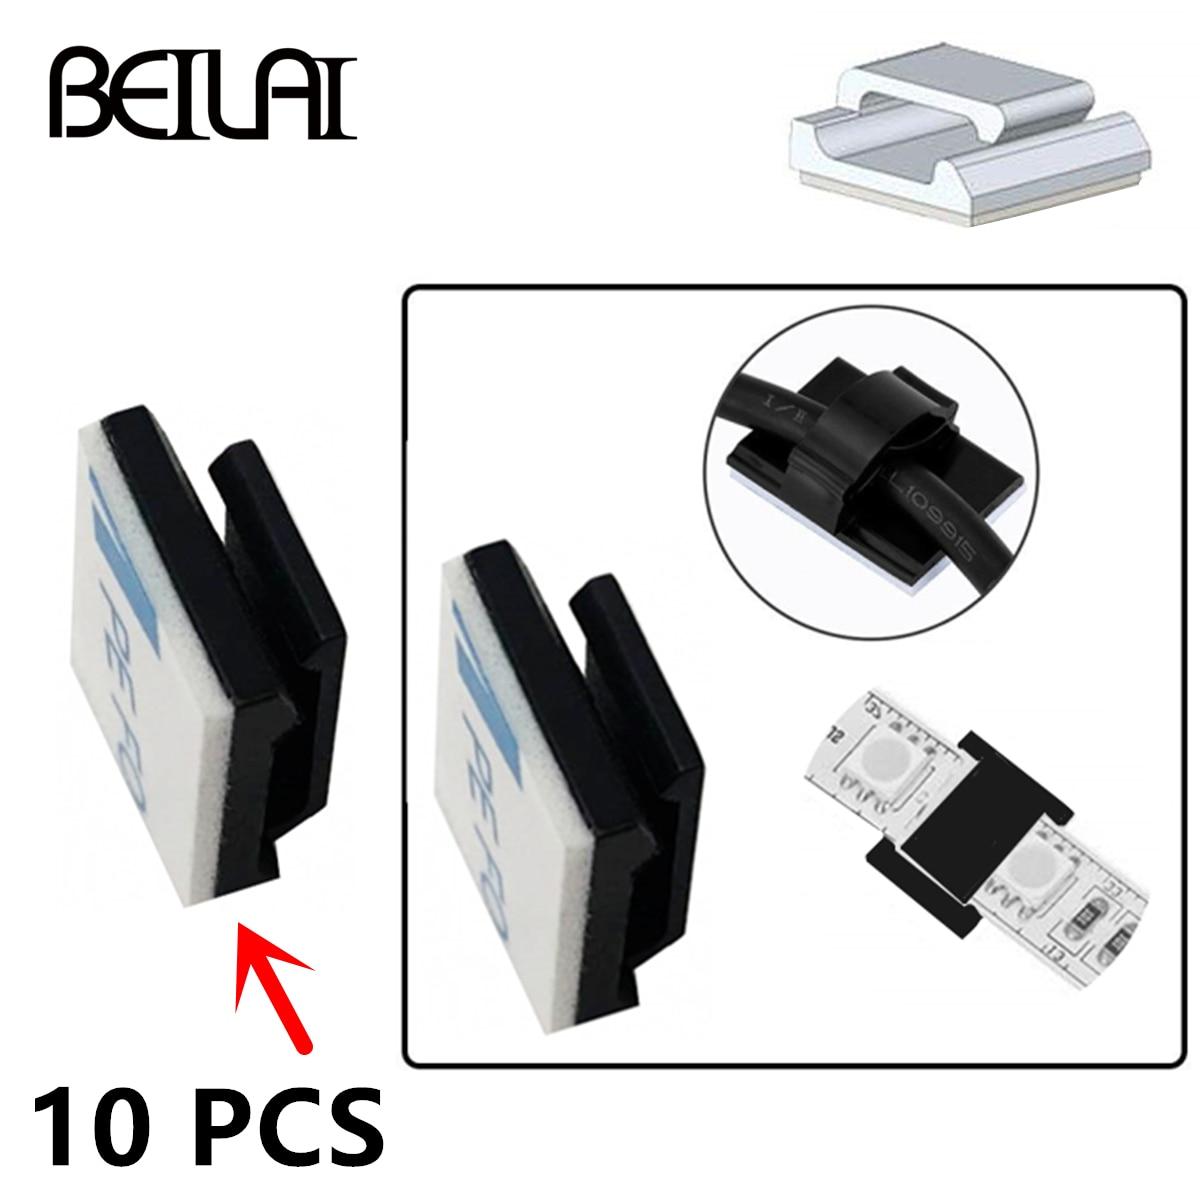 Wire Bundle Holder Tie Mount Clip Self-adhesive 10Pcs/Lot For 10mm Wide Fix RGBWW LED Strip Lights Connector Tie Mount Suitable